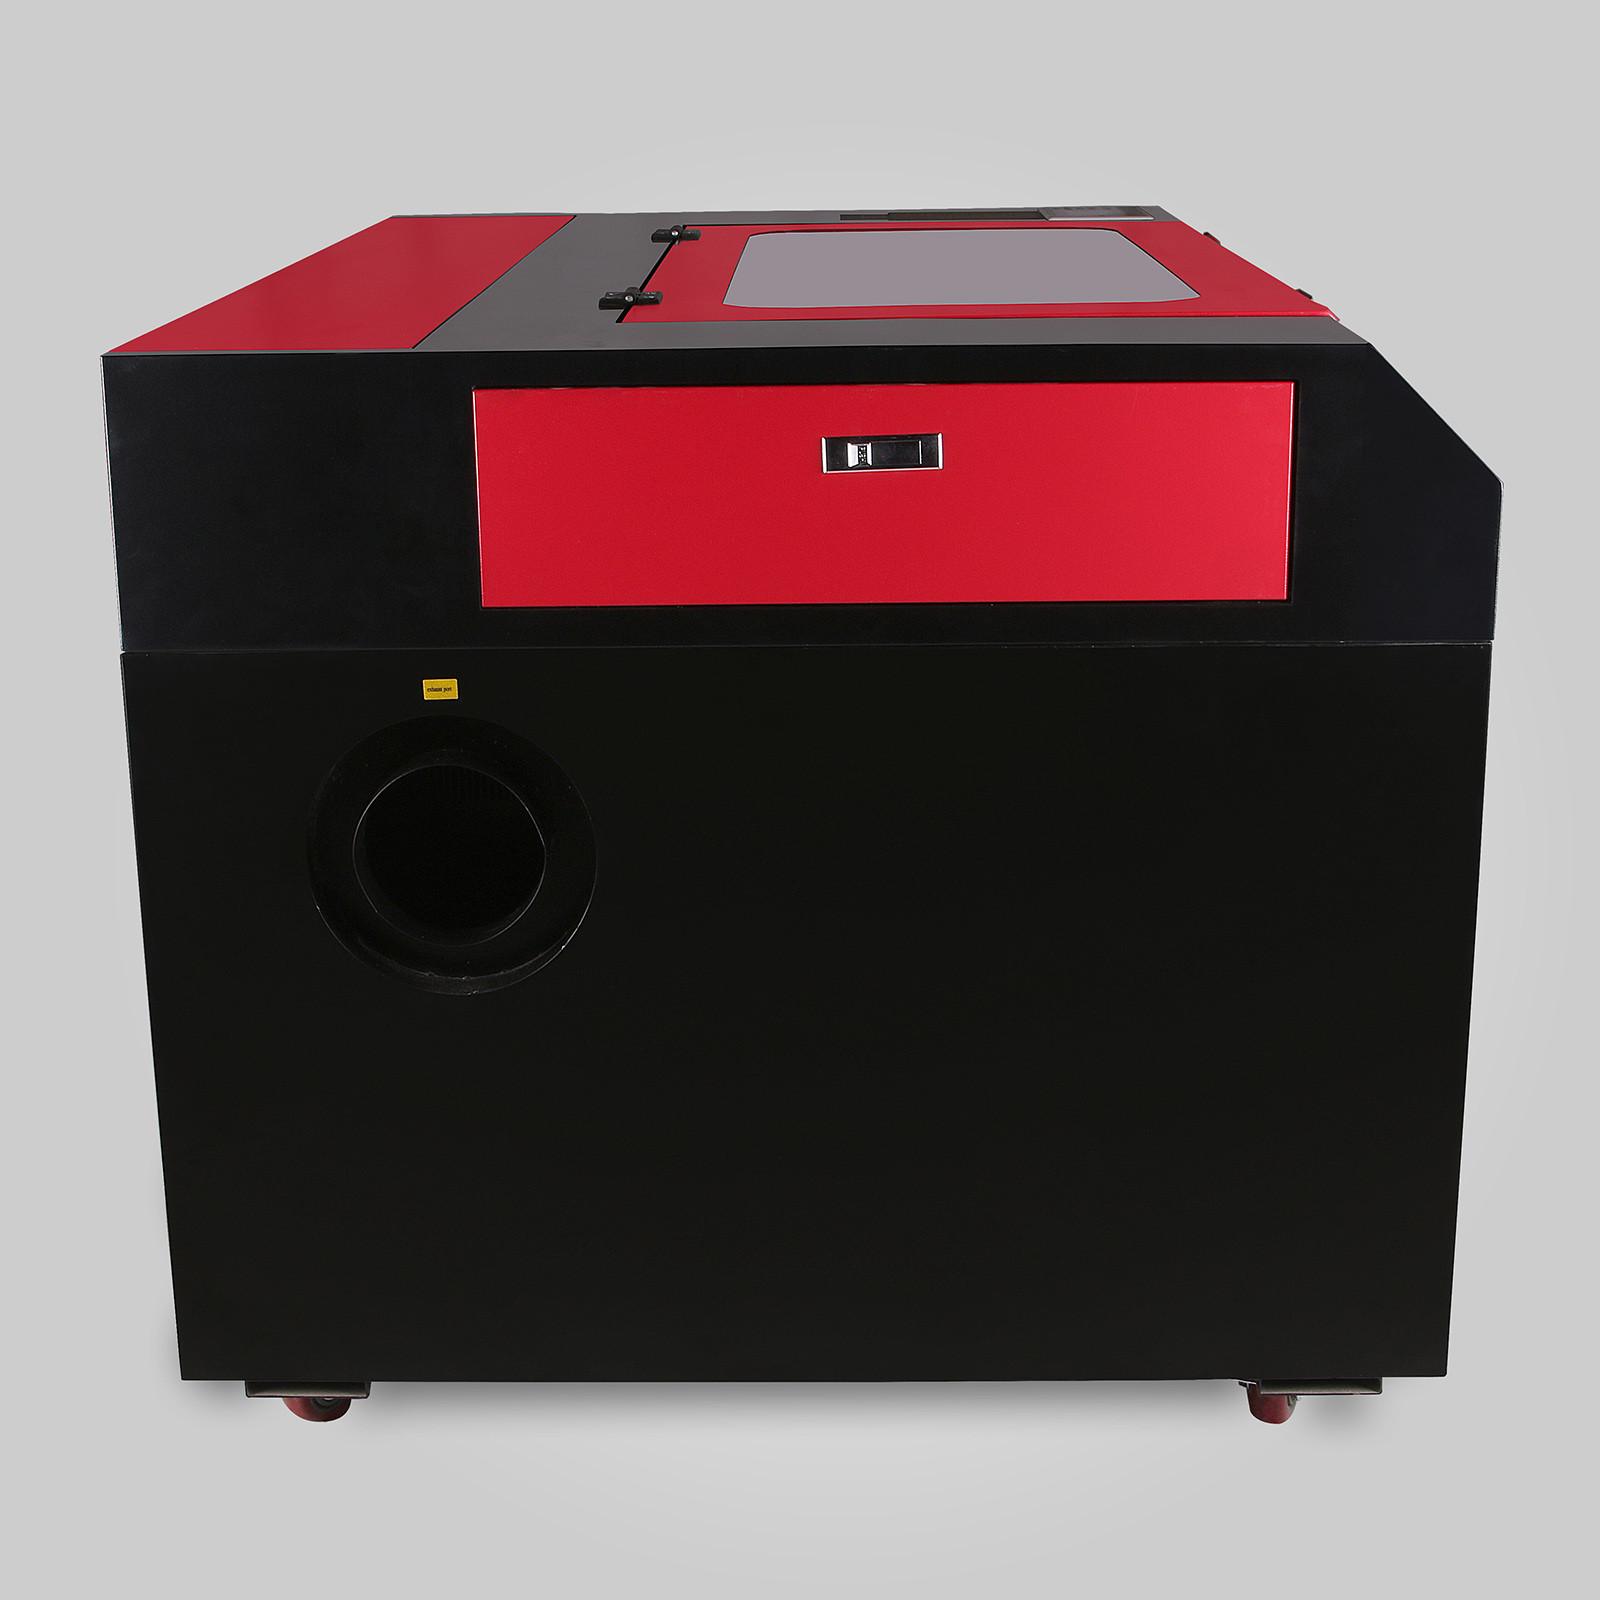 Macchina-per-Incisione-Laser-CO2-40-130W-Asse-Rotante-Tagliatrice-Incisore miniatura 62